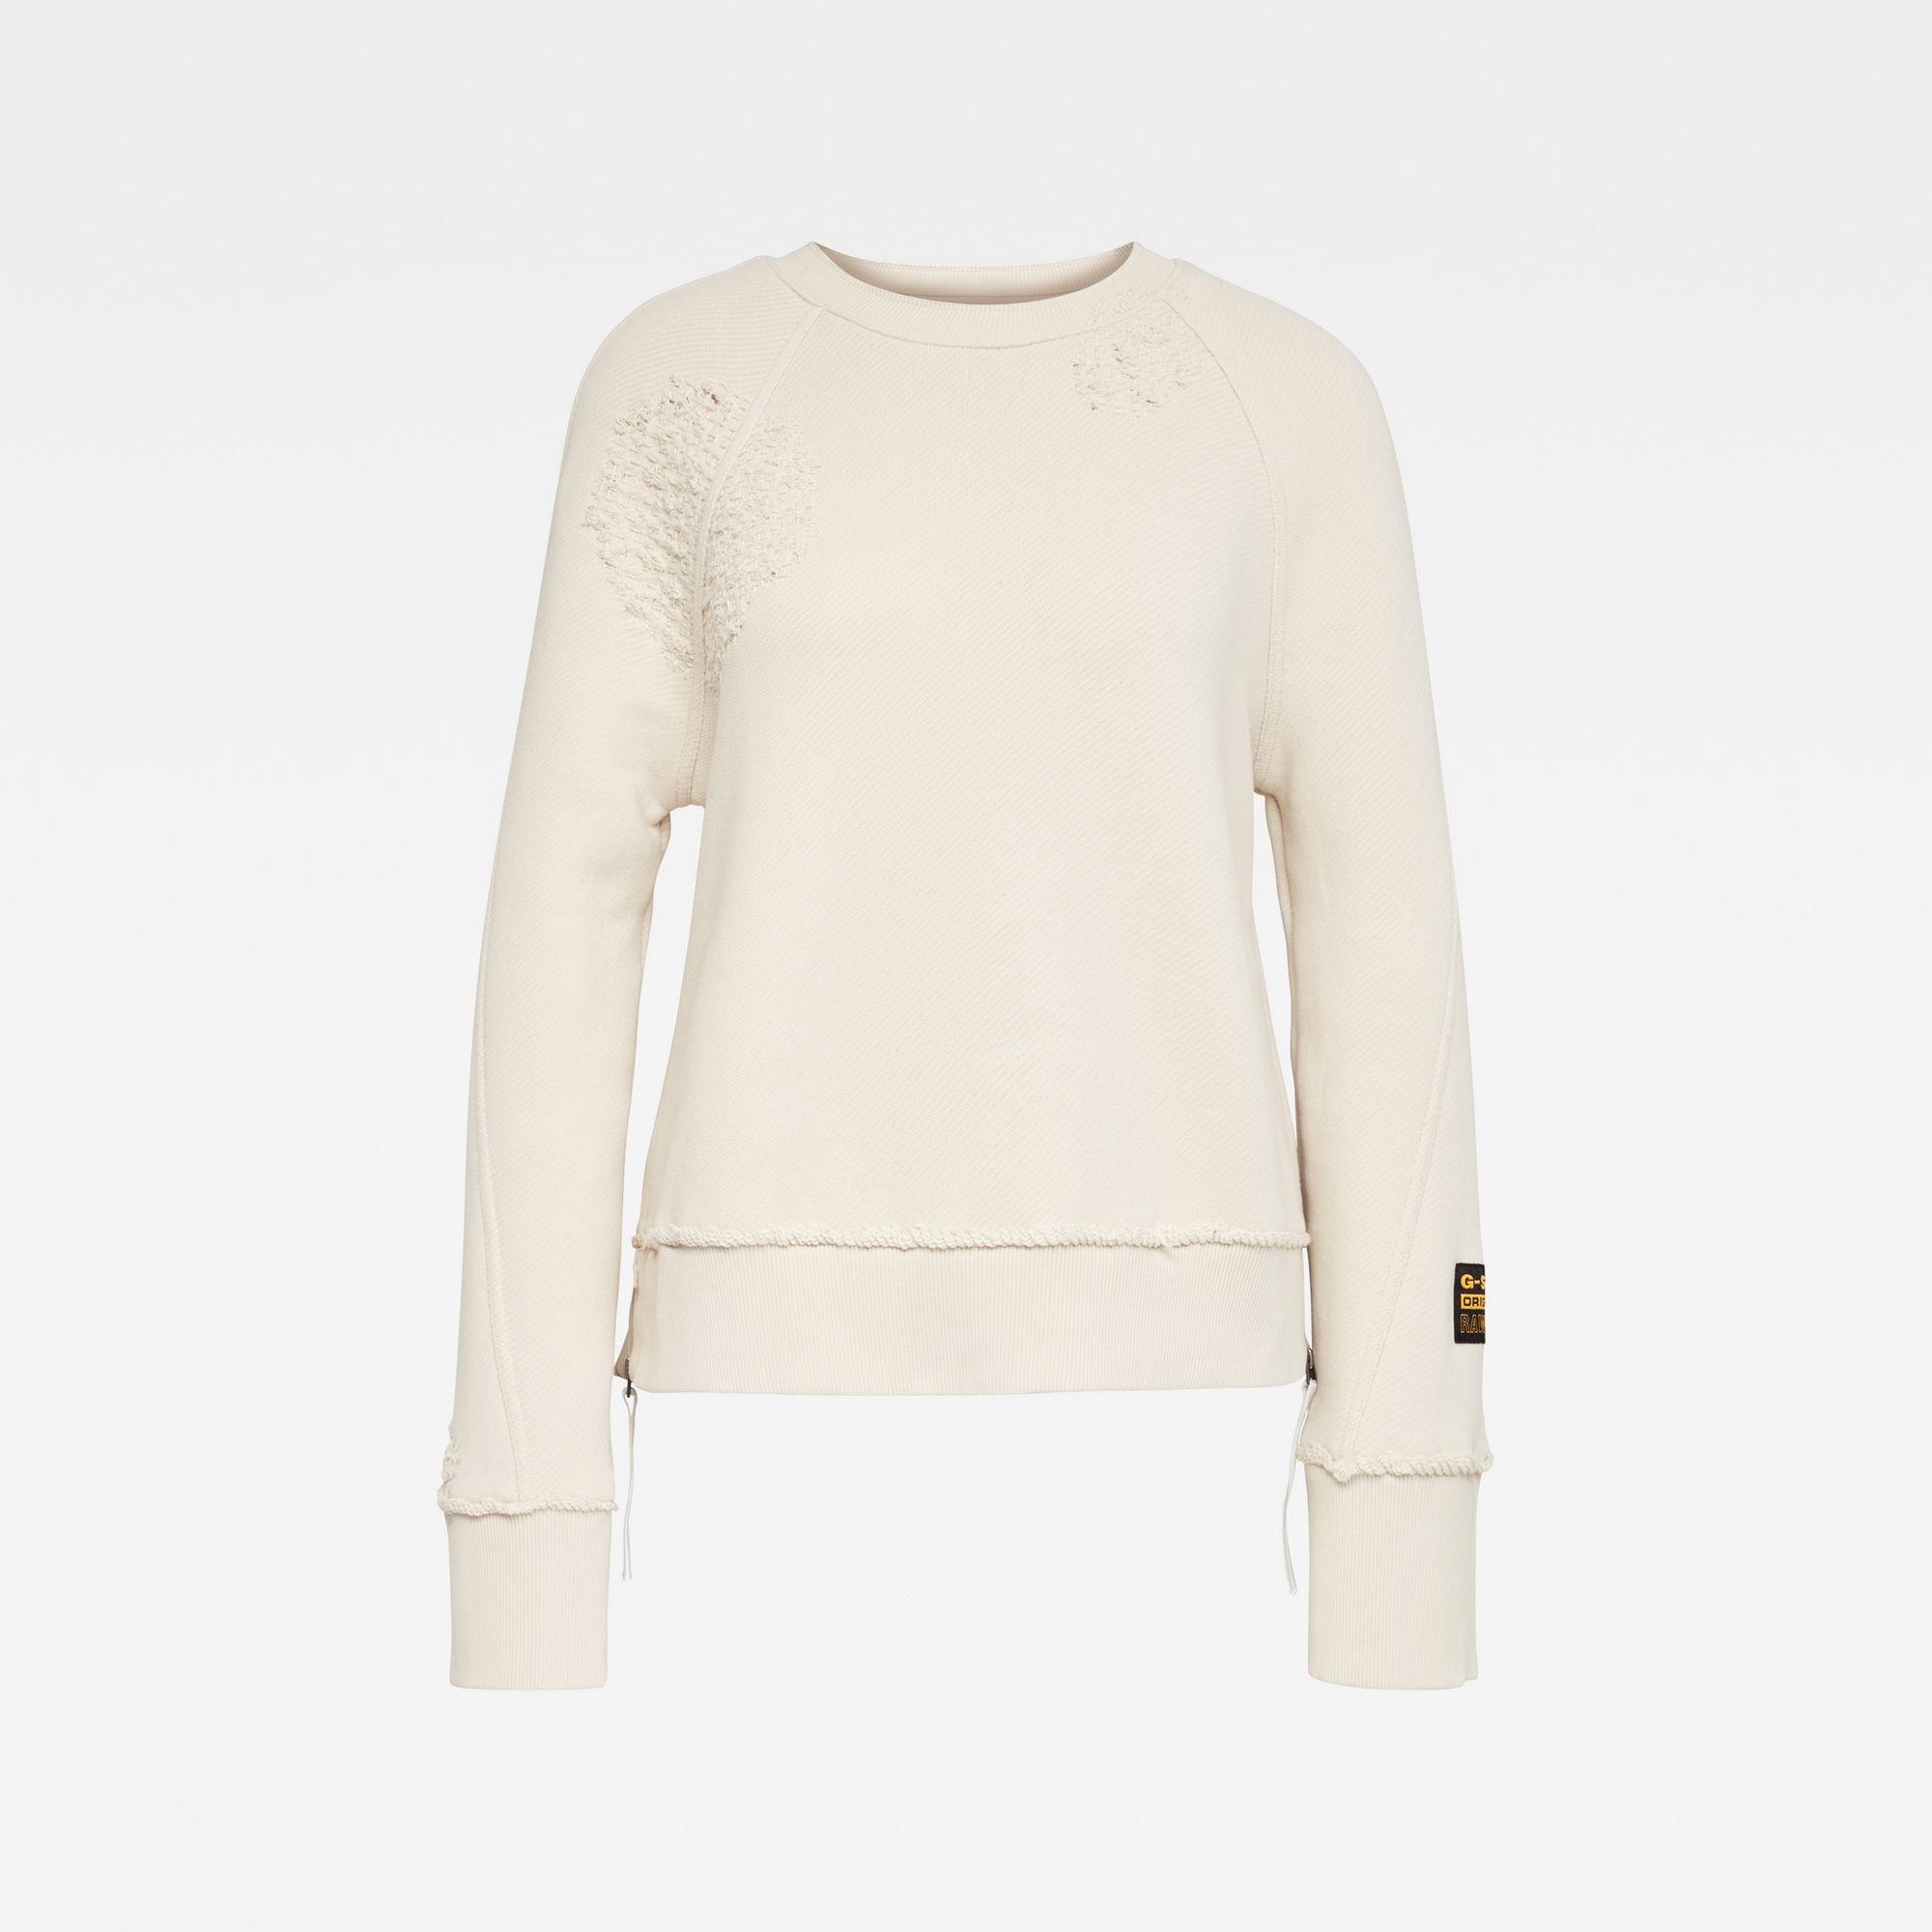 G-Star RAW Dames E Raglan Sleeve Cropped Sweater Beige